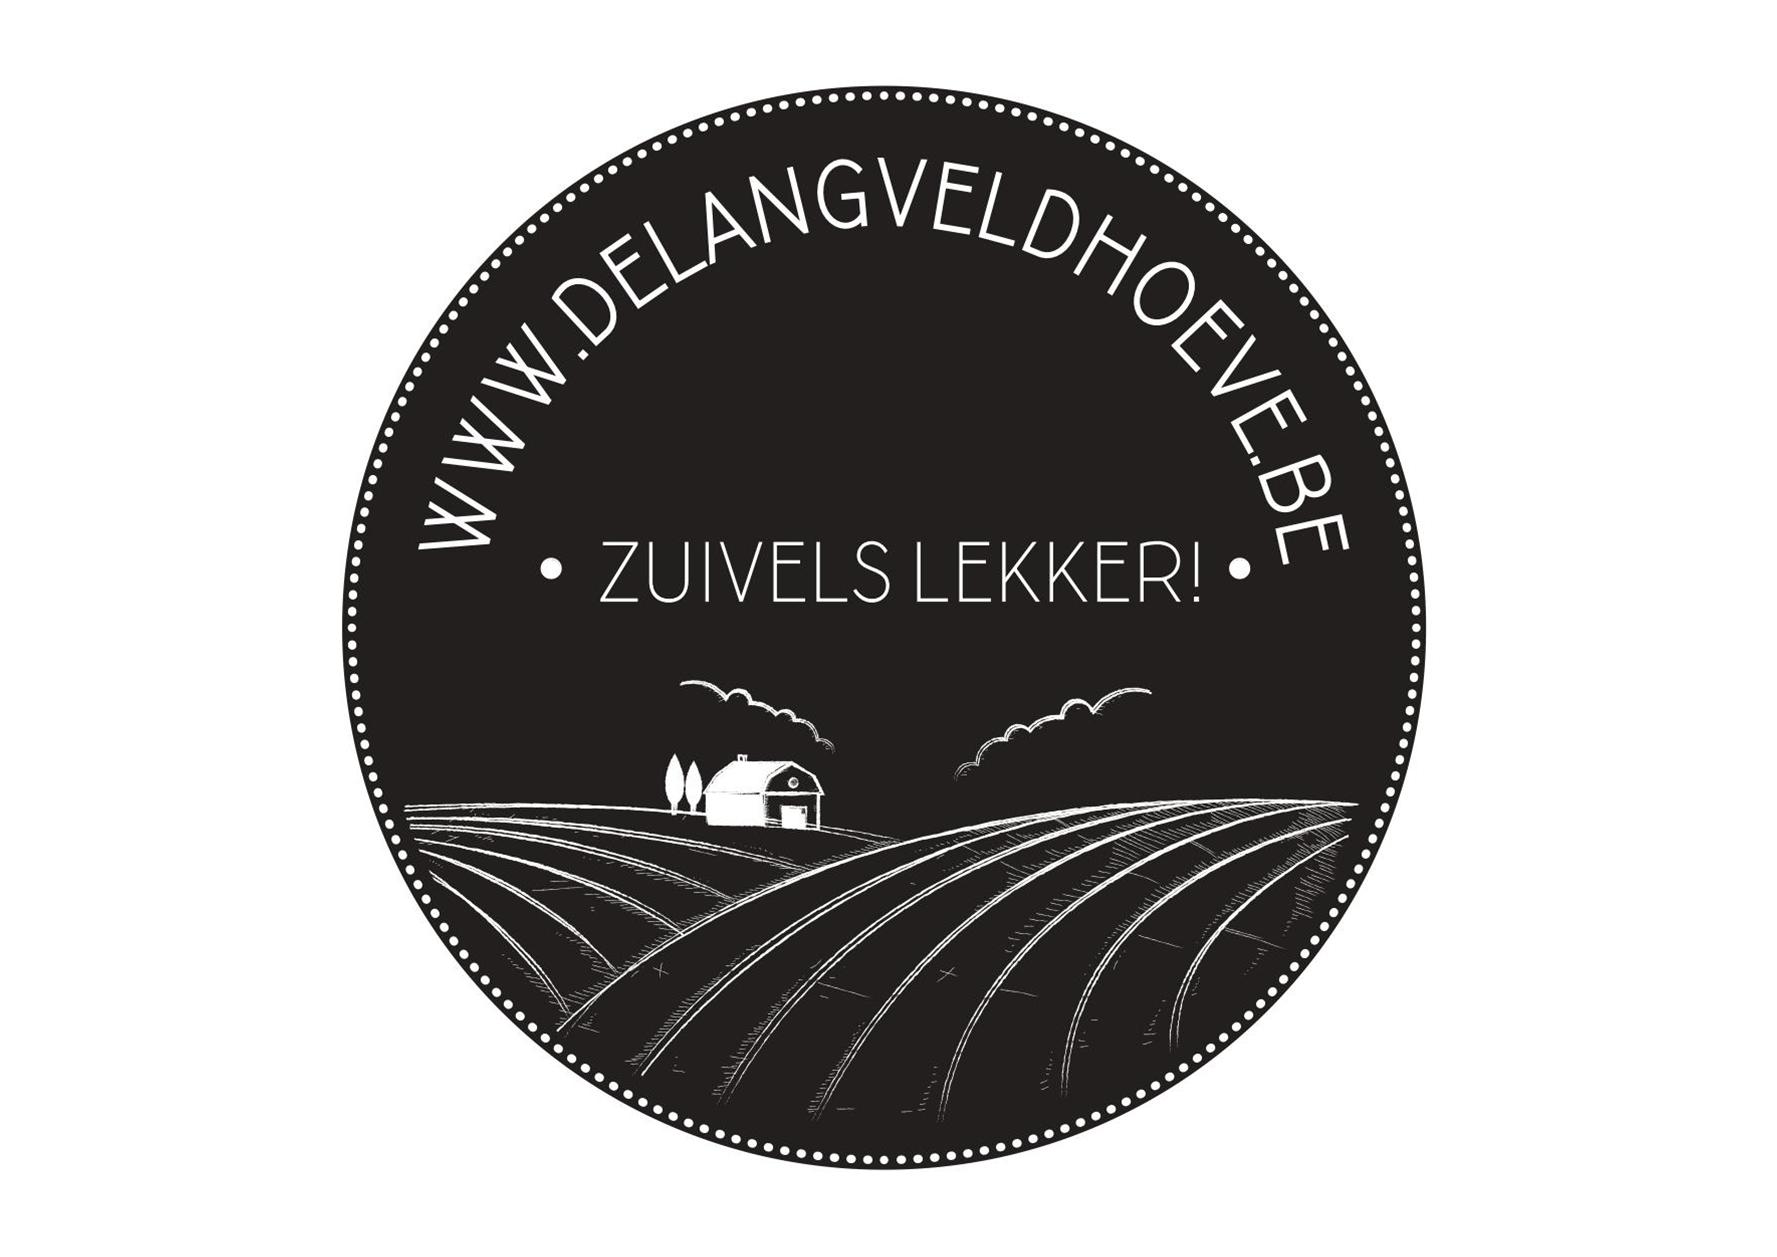 Logo De Langveldhoeve